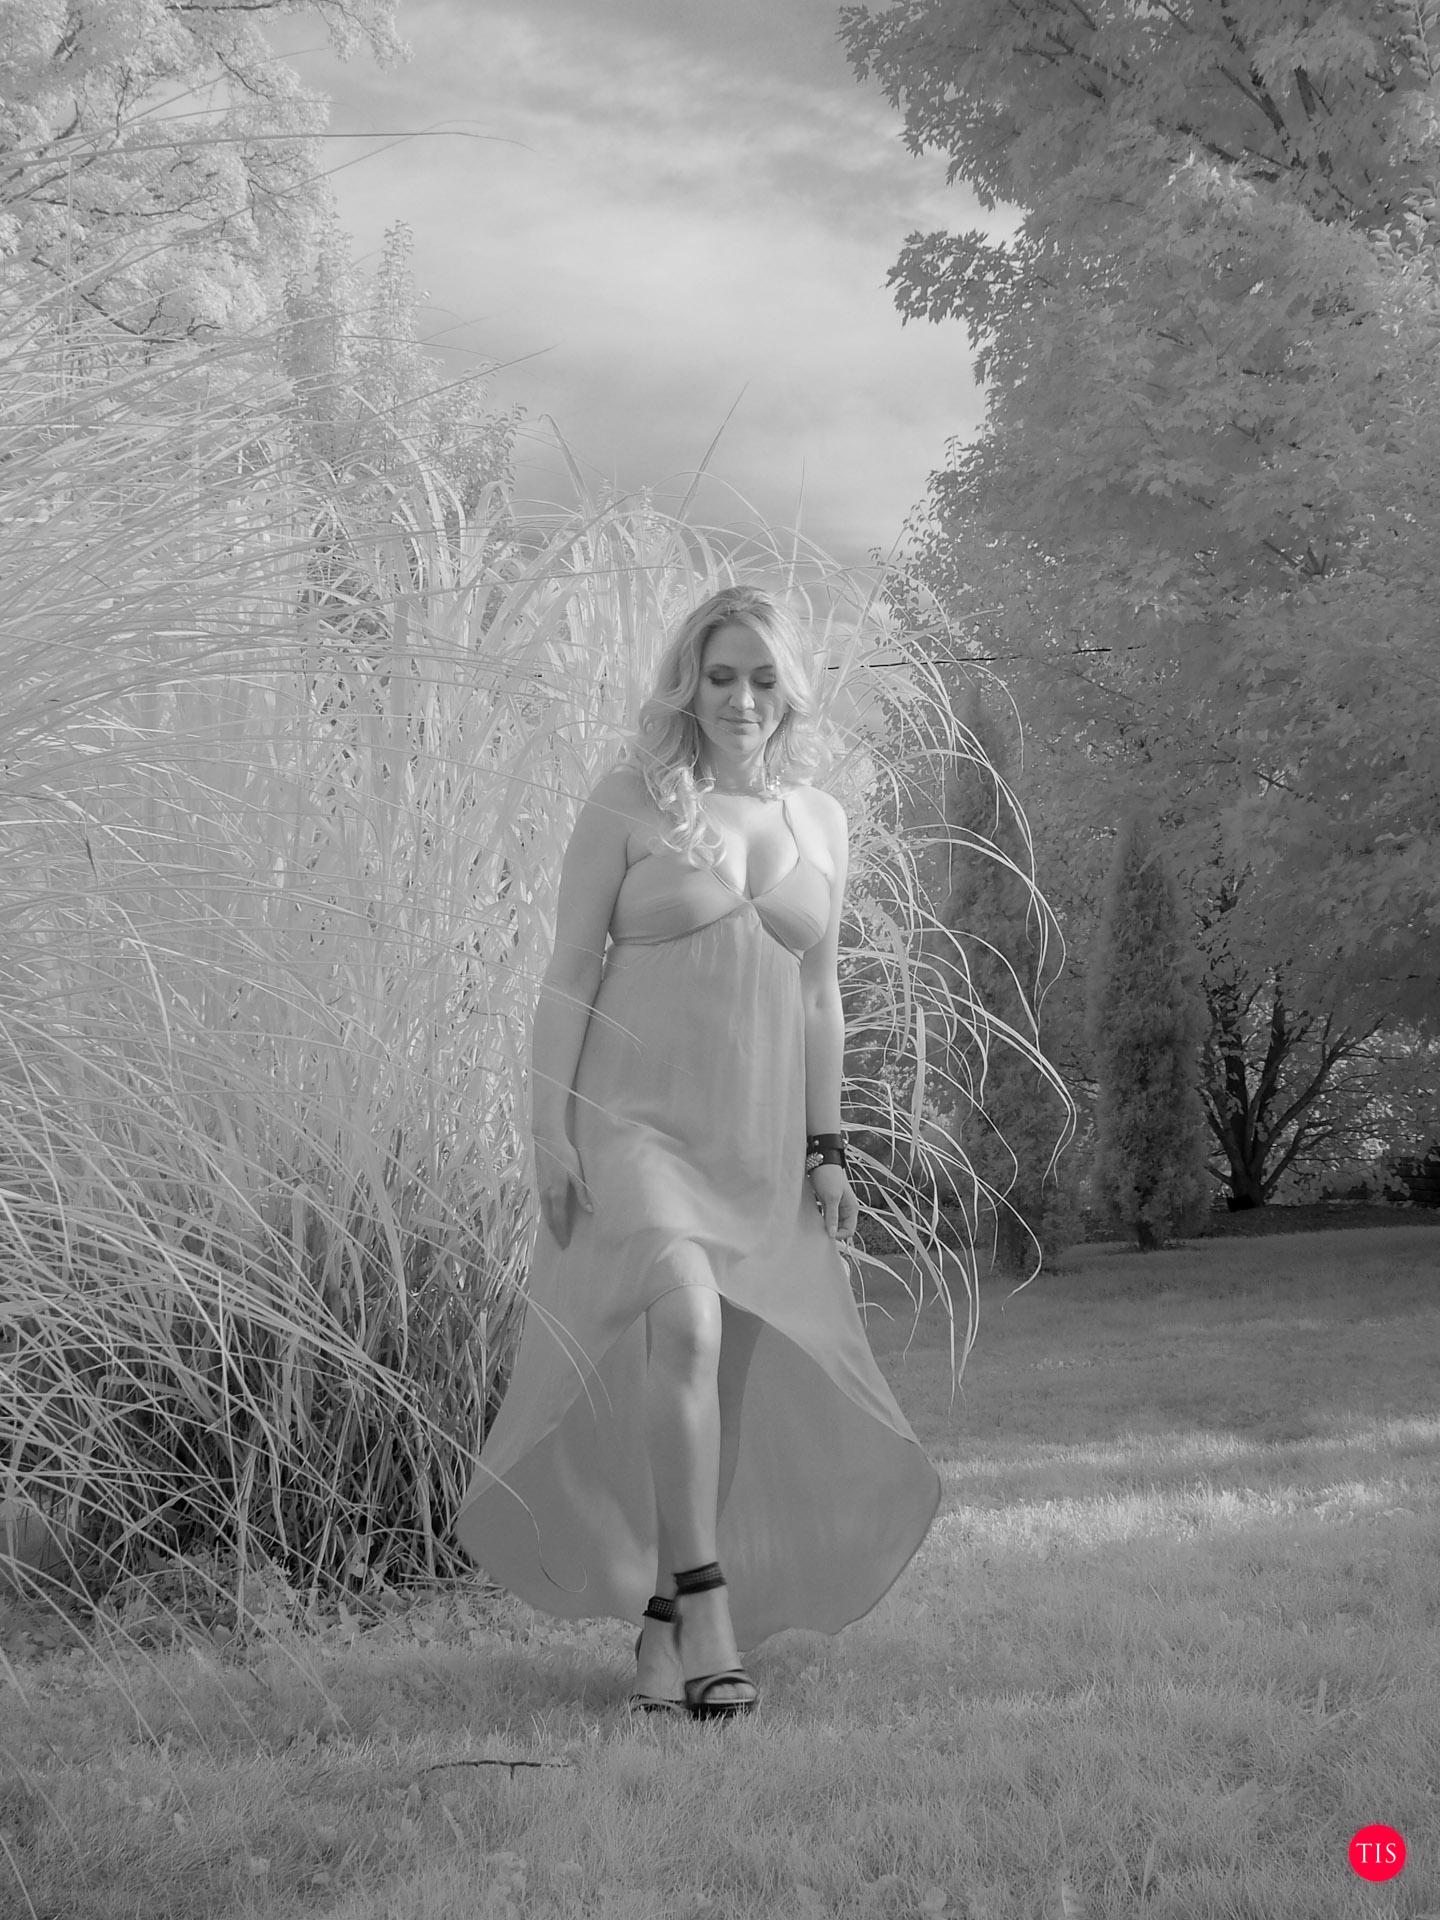 Dress by Express